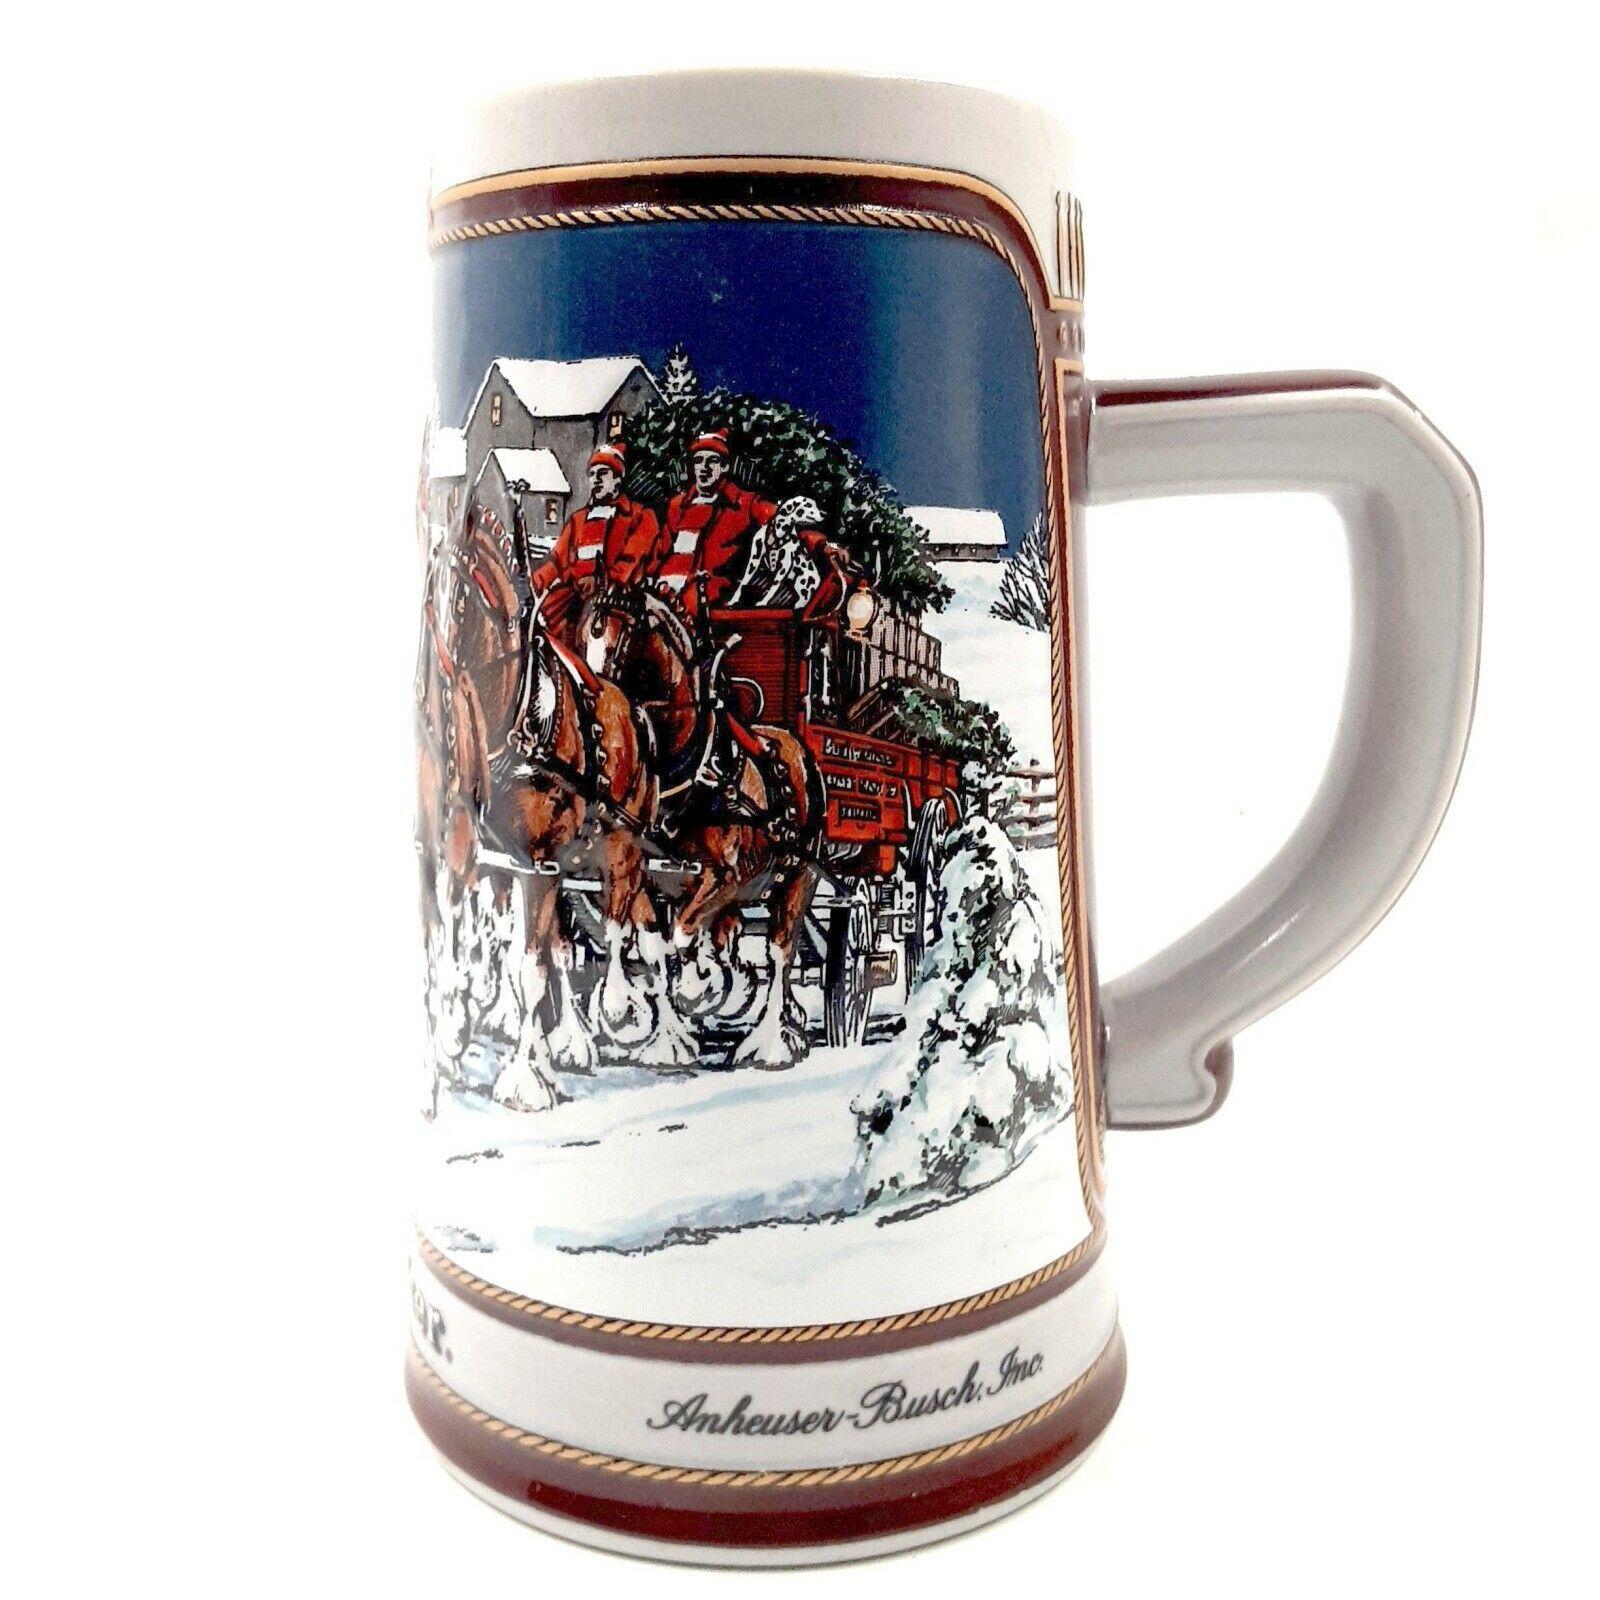 Vintage 1989 Anheuser-Busch Budweiser Clydesdales Collector's Series Beer Stein - $14.99